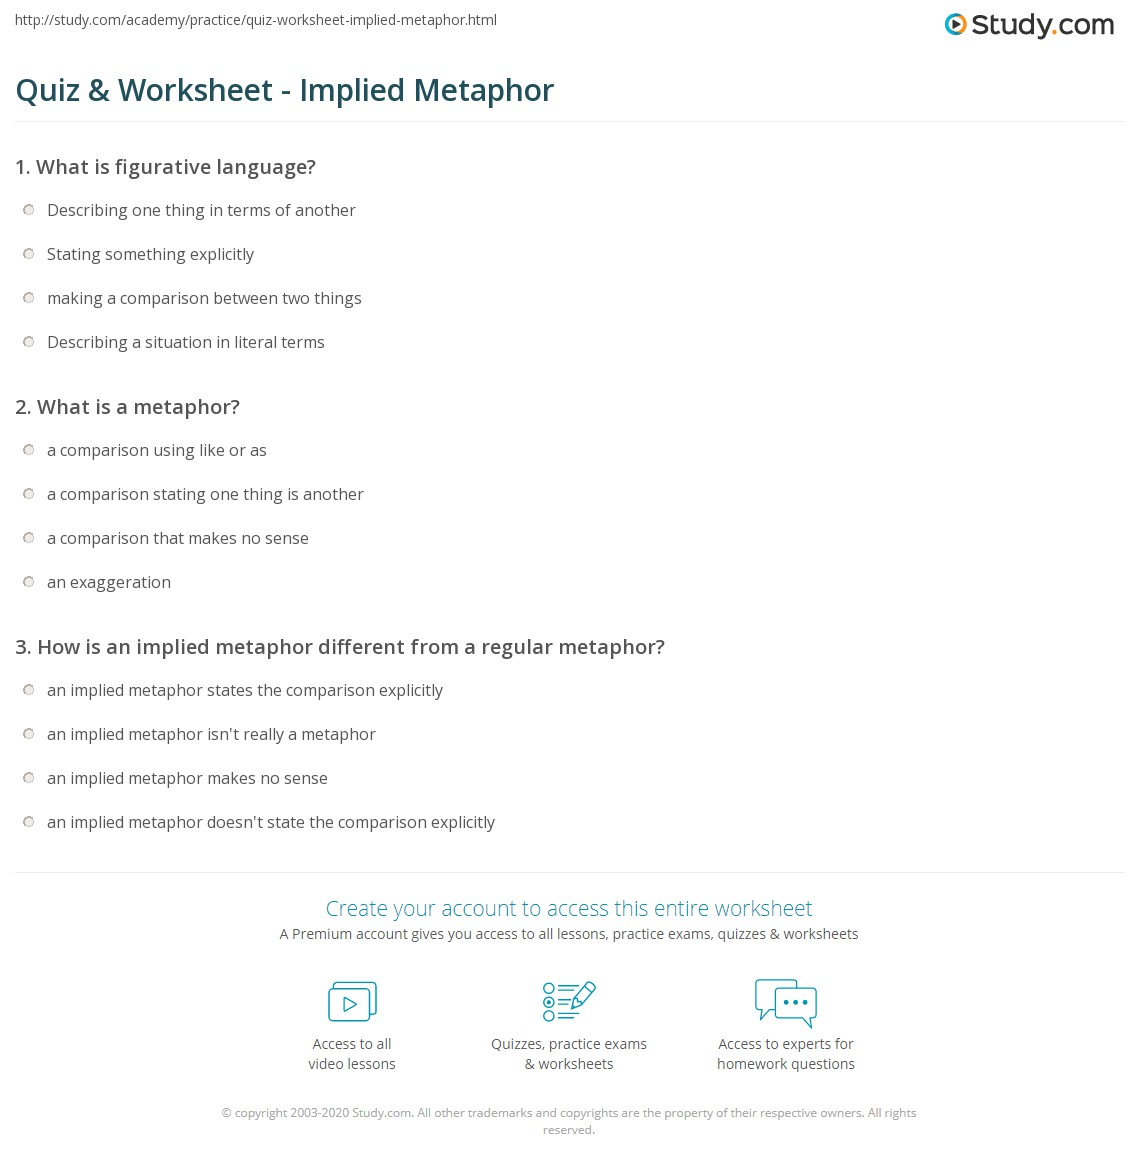 Quiz & Worksheet - Implied Metaphor | Study.com